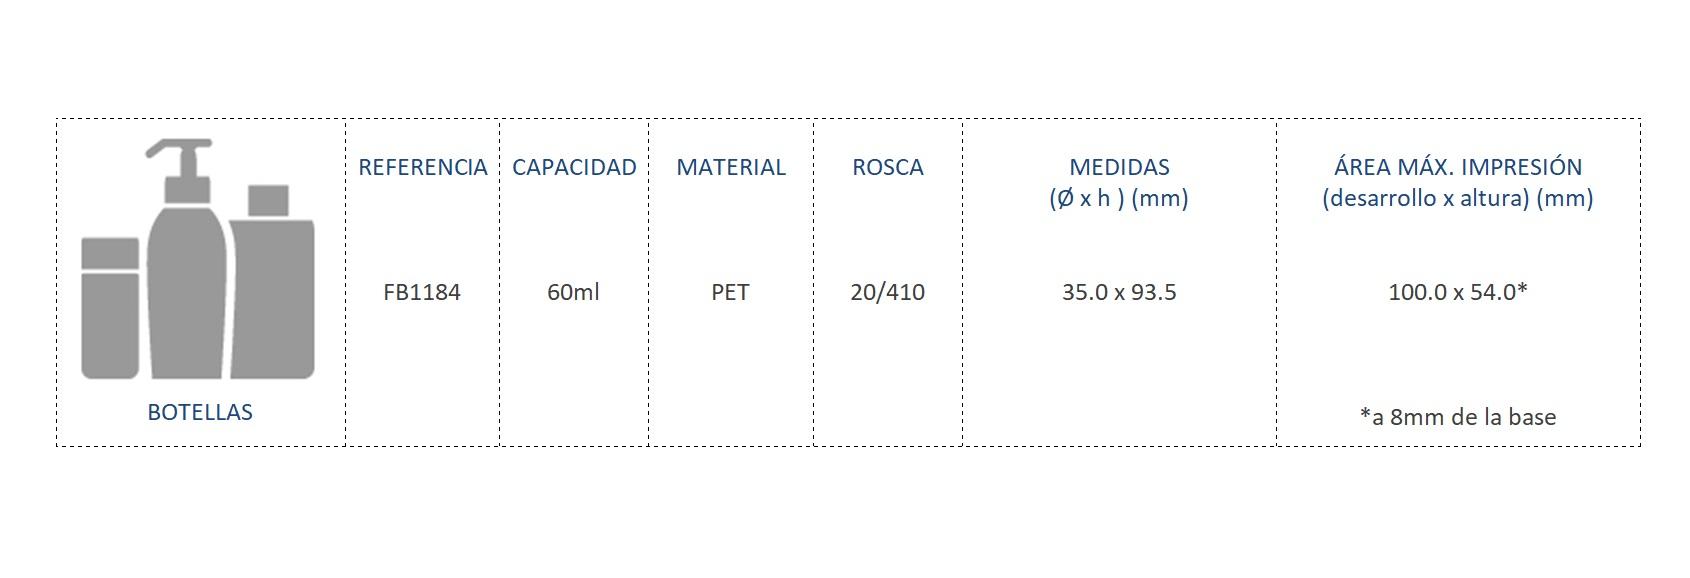 Cuadro de materiales FB1184